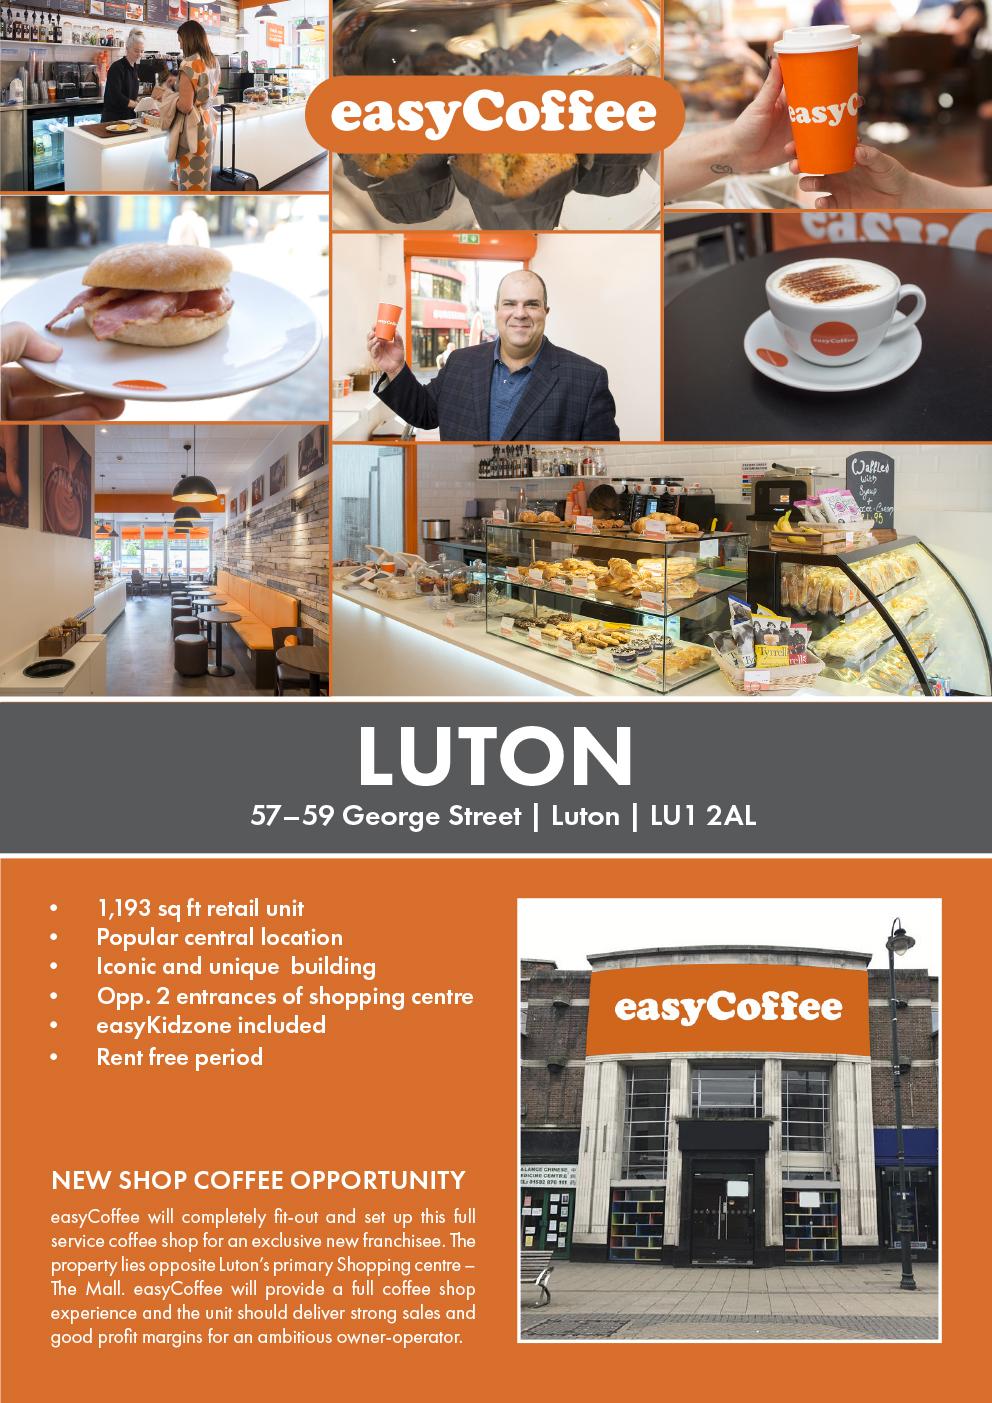 easyCoffee shop_Luton_1.jpg